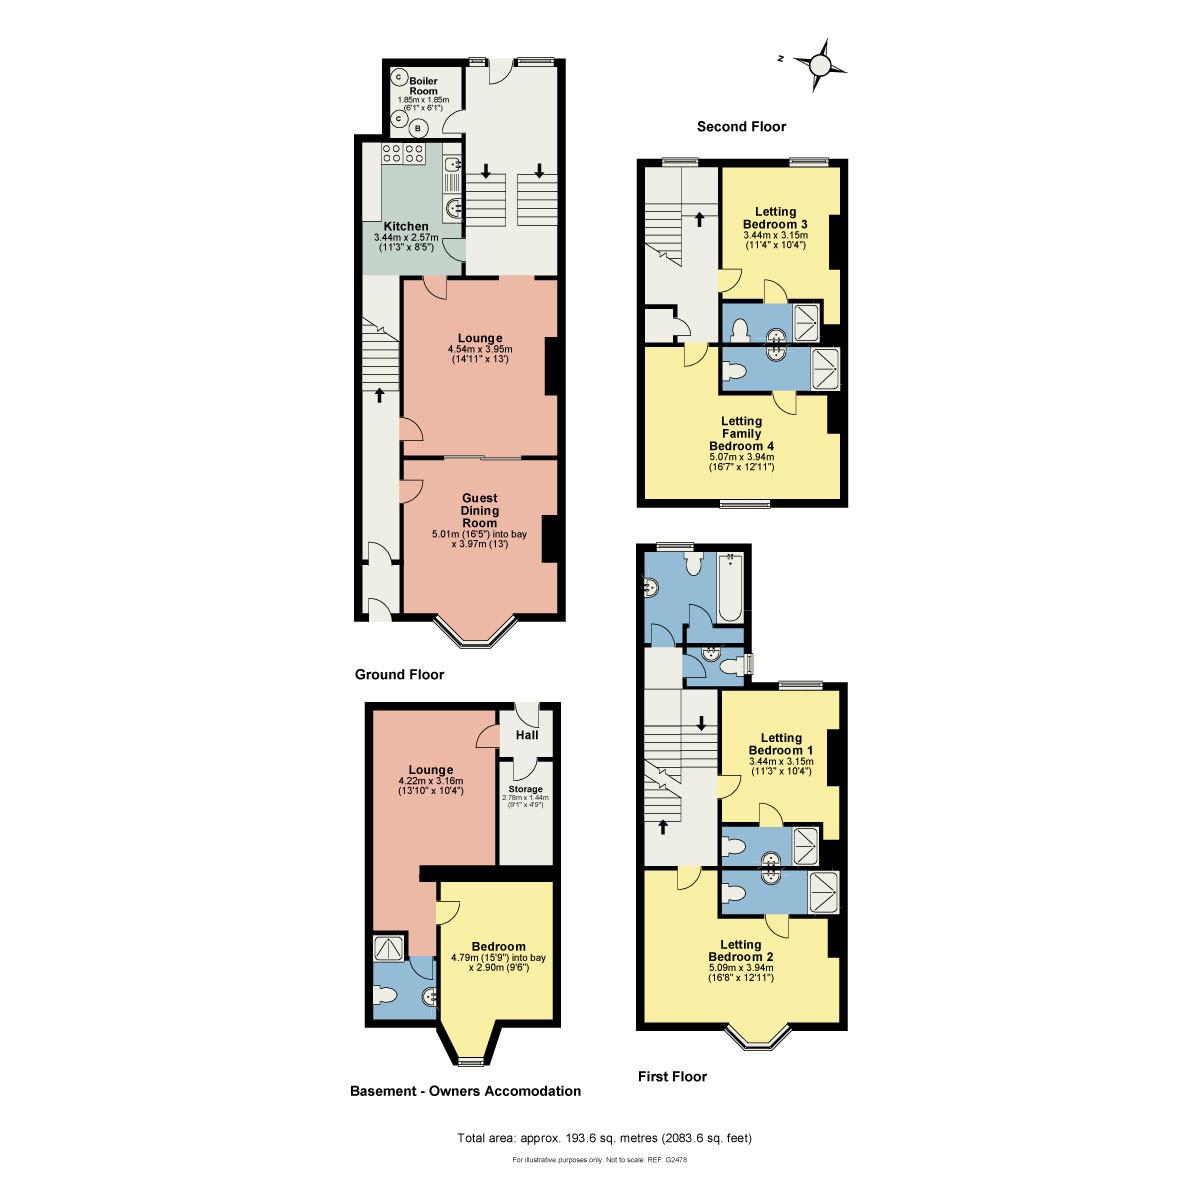 Floorplan Birchleigh Guest House, Kents Bank Road, Grange-over-Sands, Cumbria, LA11 7EY